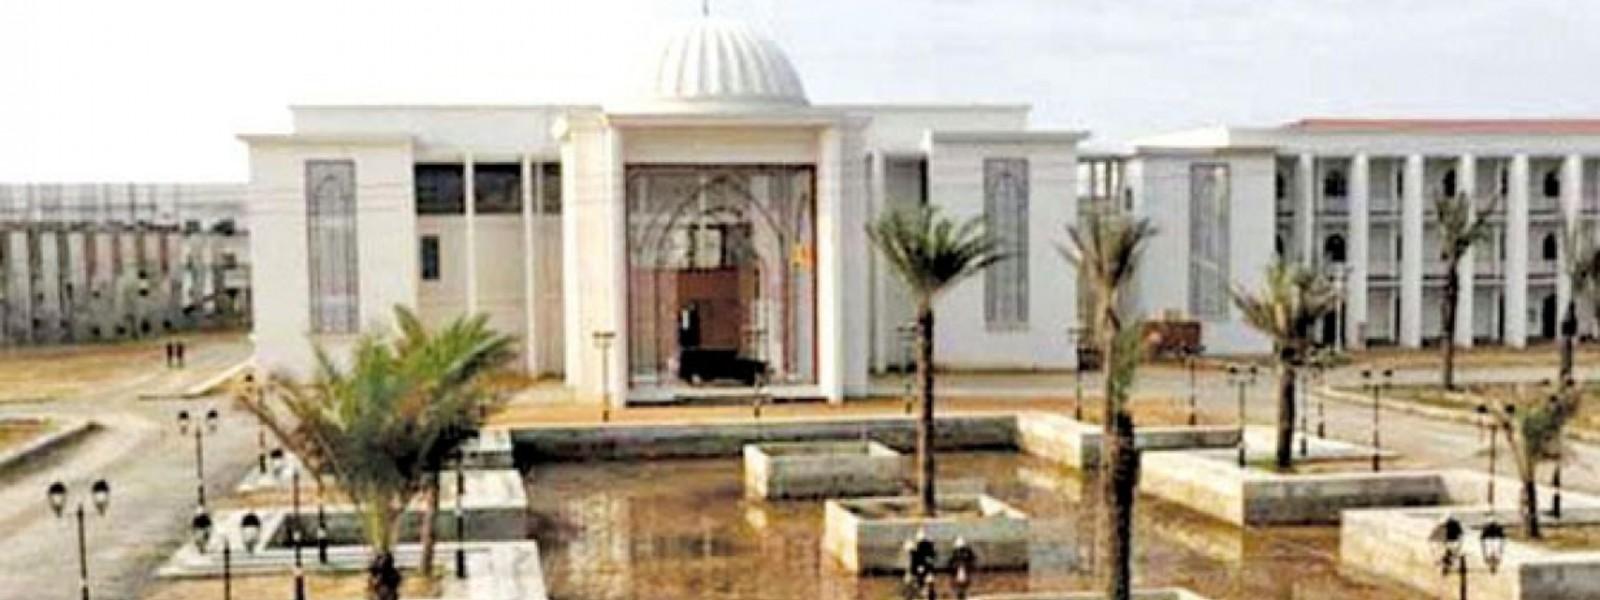 Batticaloa Campus will be a new university; Education Minister